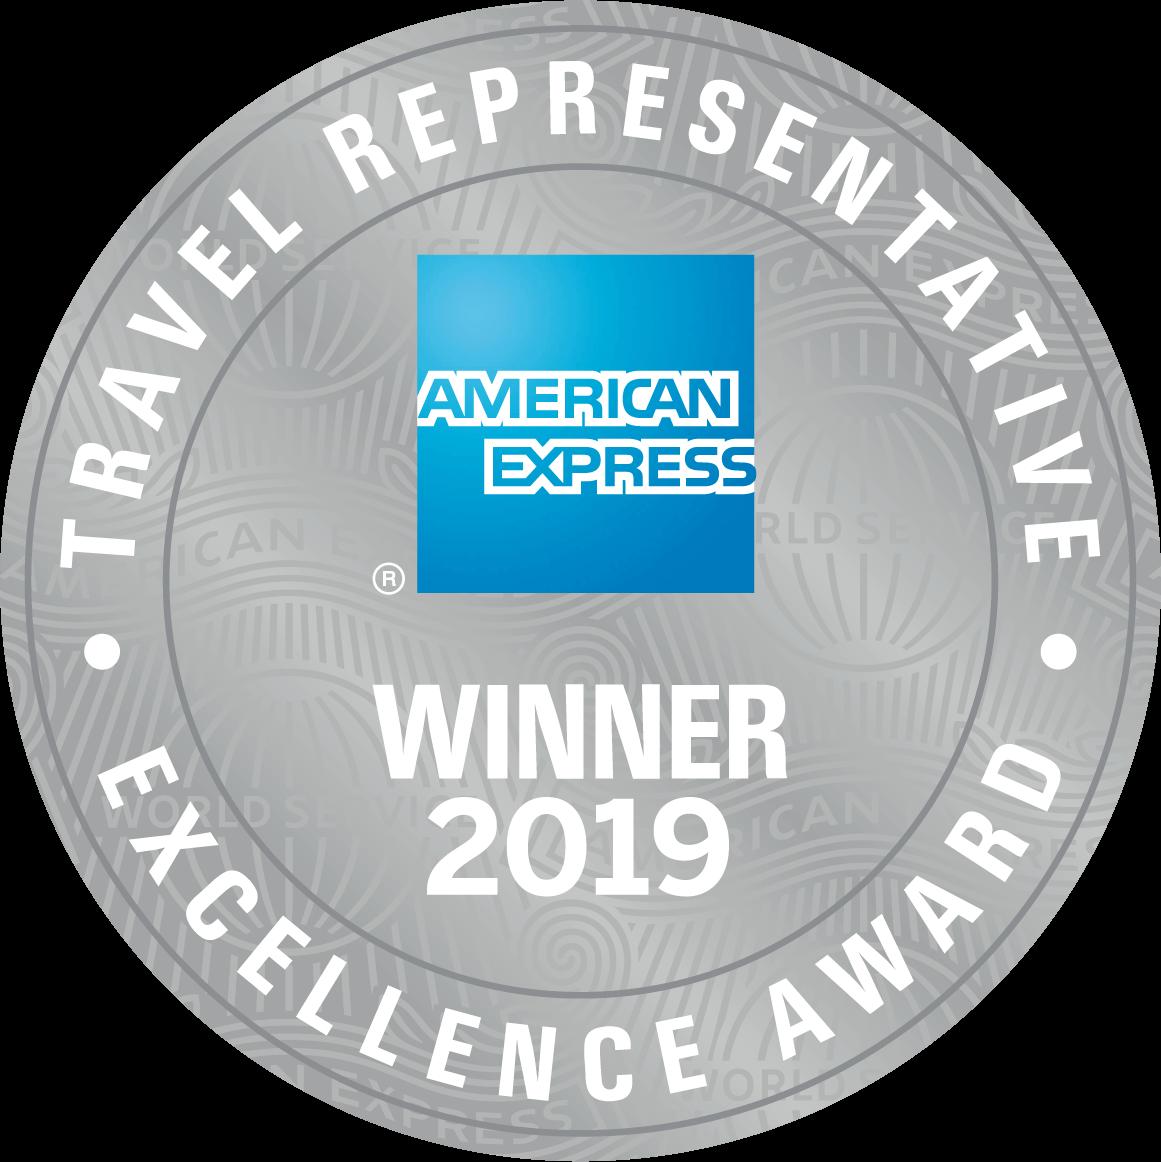 American Express Travel Agency Near Me